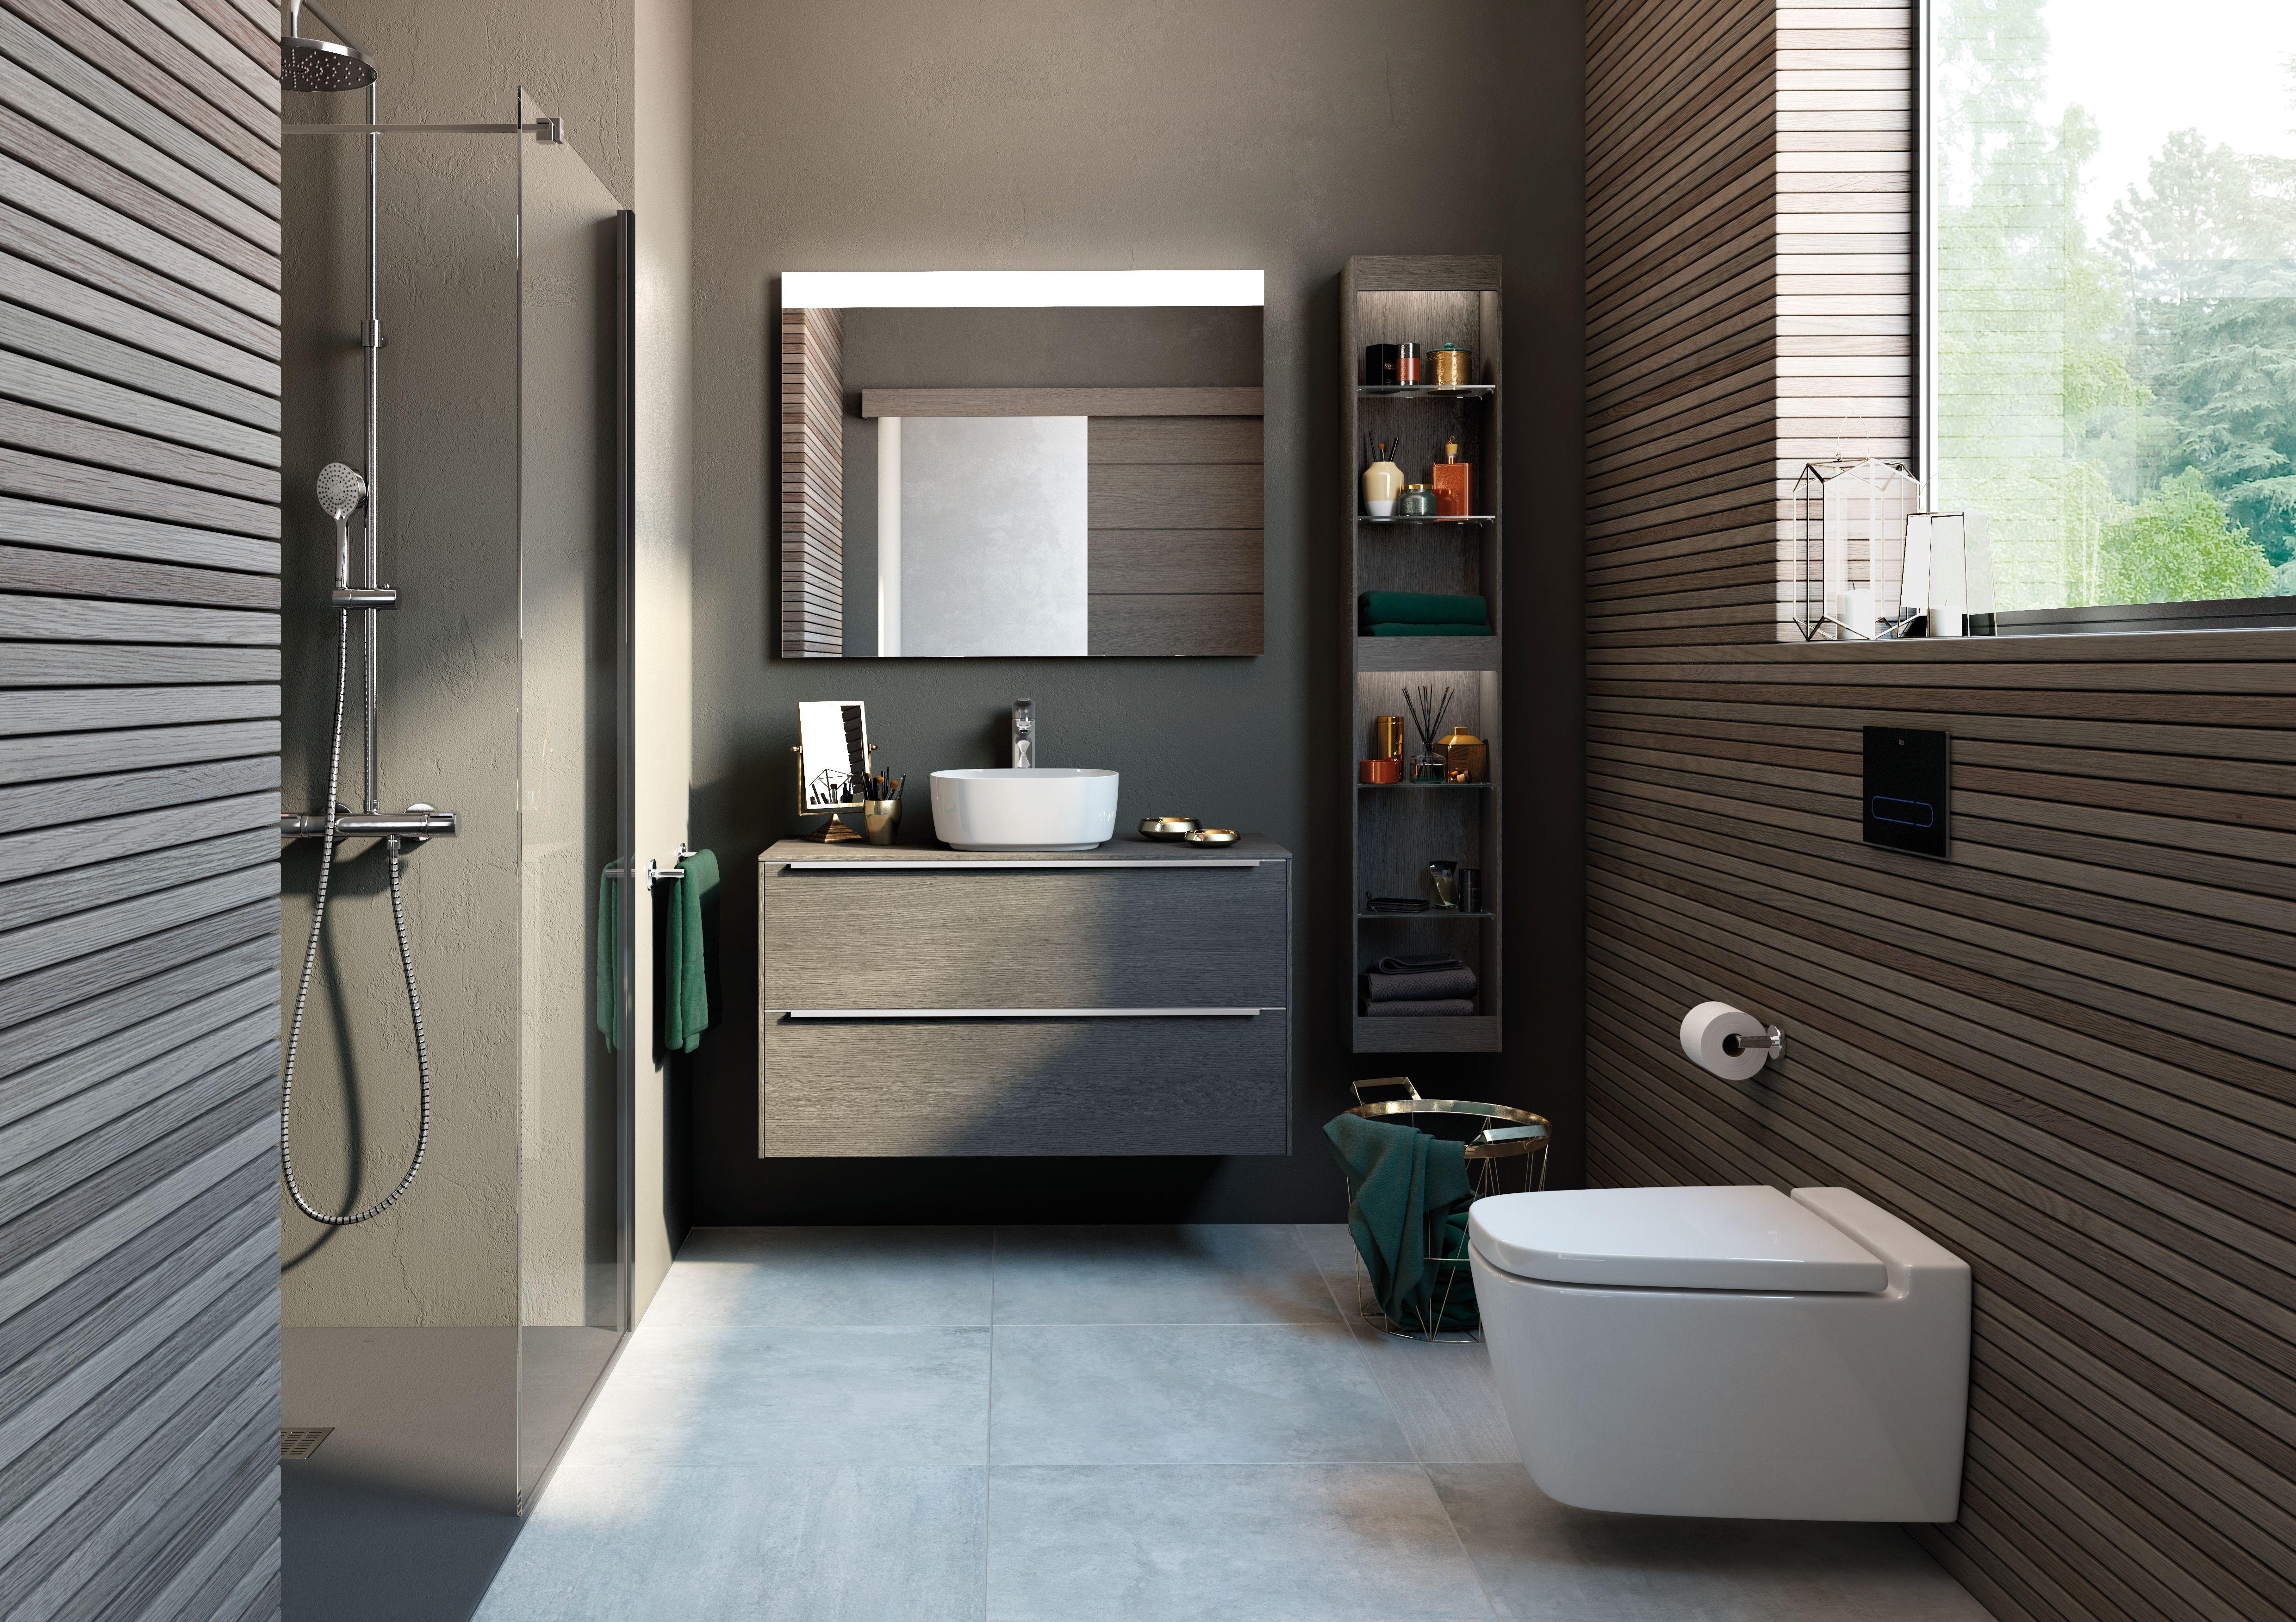 Inspira De Roca Nouvelle Salle De Bain Sanitaires En Fine Ceramic Meuble Tiroir Miroir Wc Suspendu Rimless Roca Bathroom Lavatory Design Bathroom Design